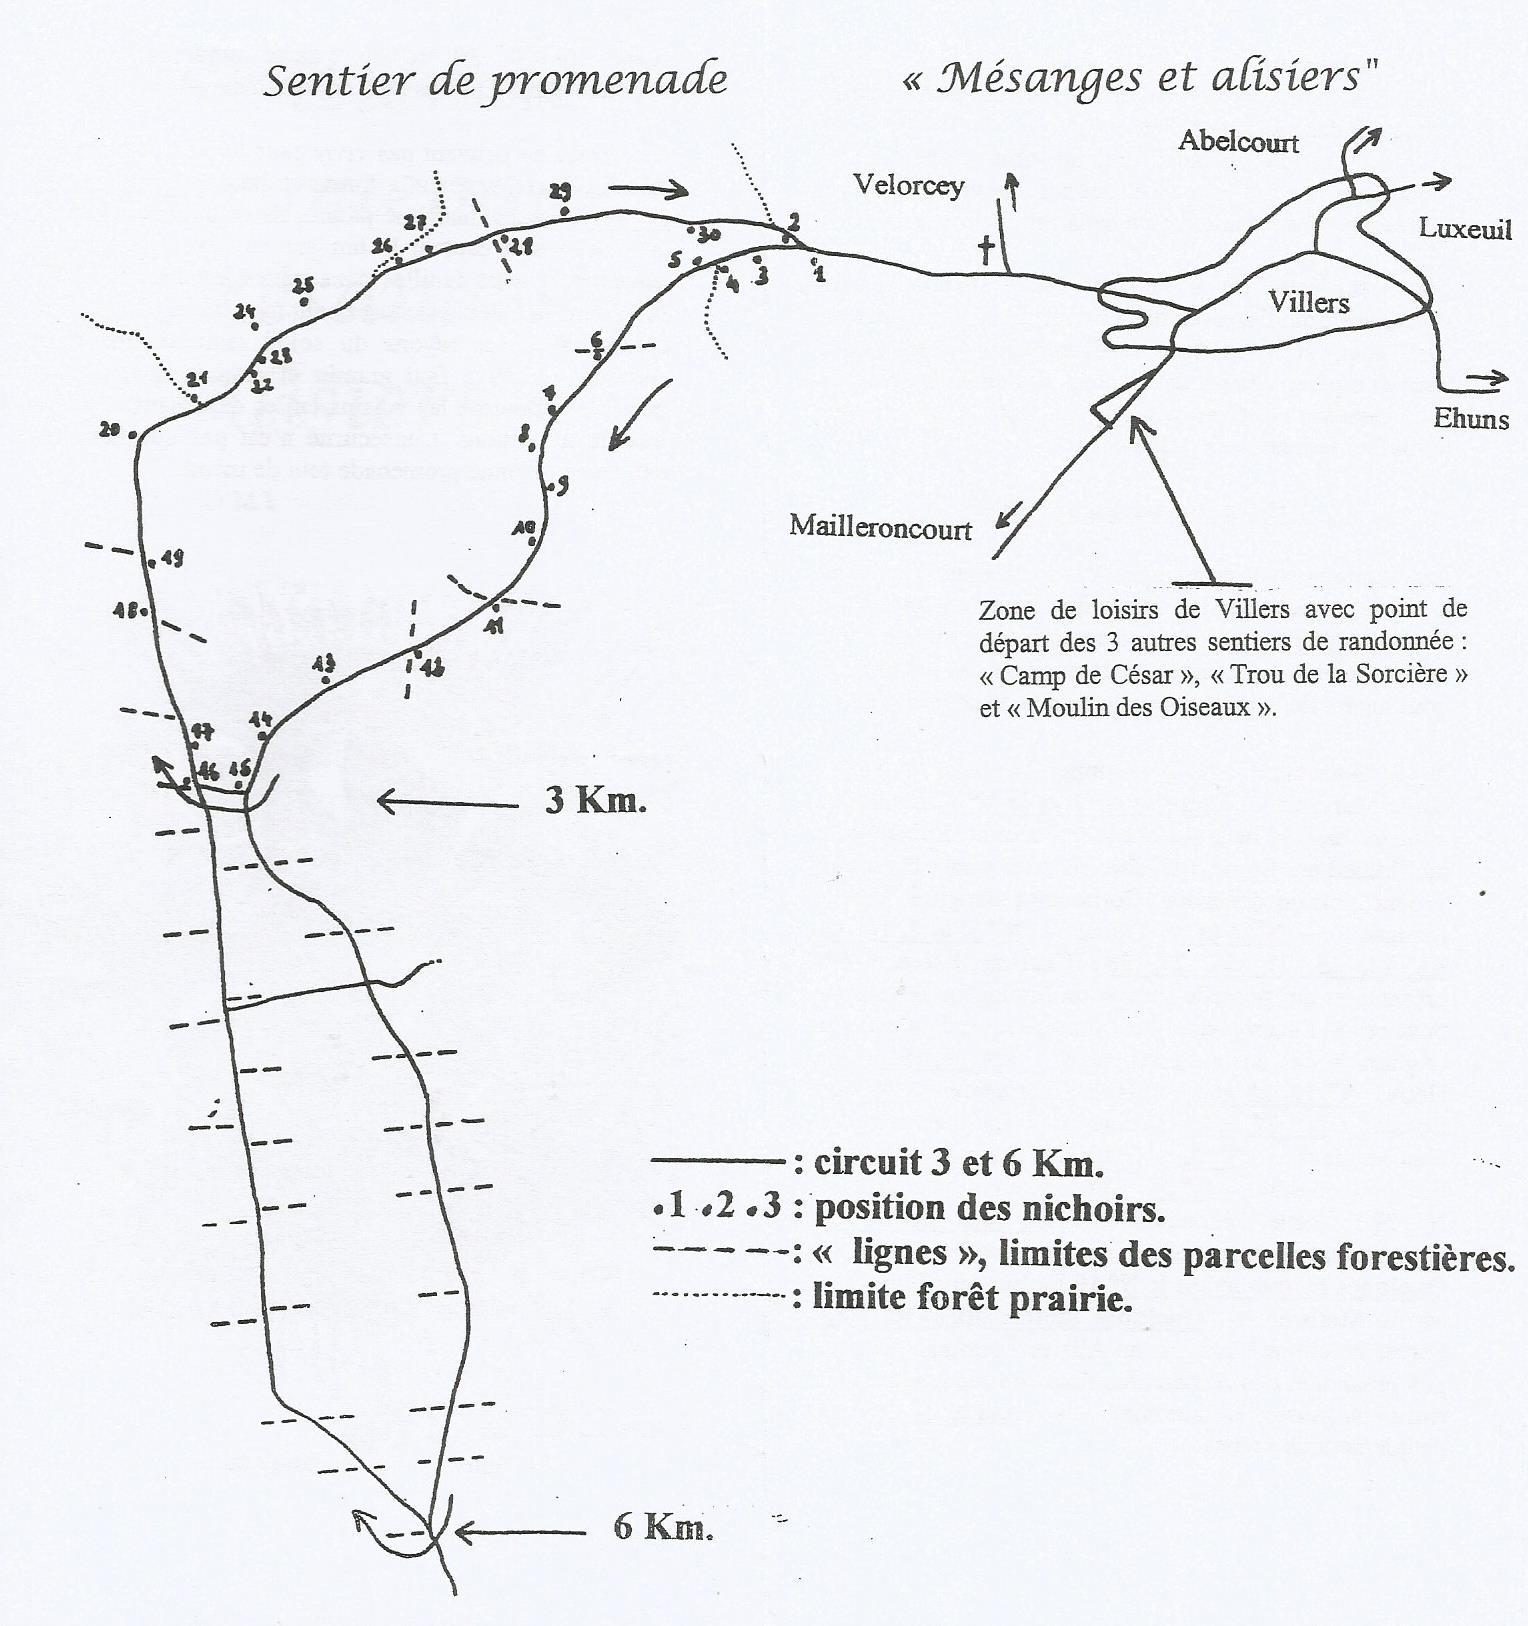 https://www.villers-les-luxeuil.com/projets/villers/files/images/0_Base_LVC/Randonnees/Randonnee_Mesanges_Alisiers_Plan.jpg